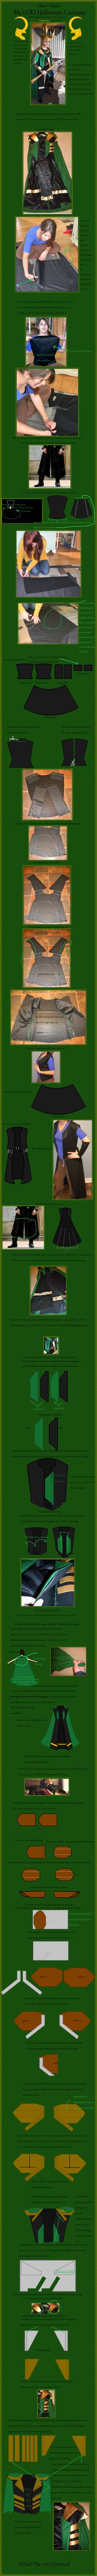 My LOKI Costume Tutorial: Coat/ Cape by The-Lighted-Soul.deviantart.com on @deviantART